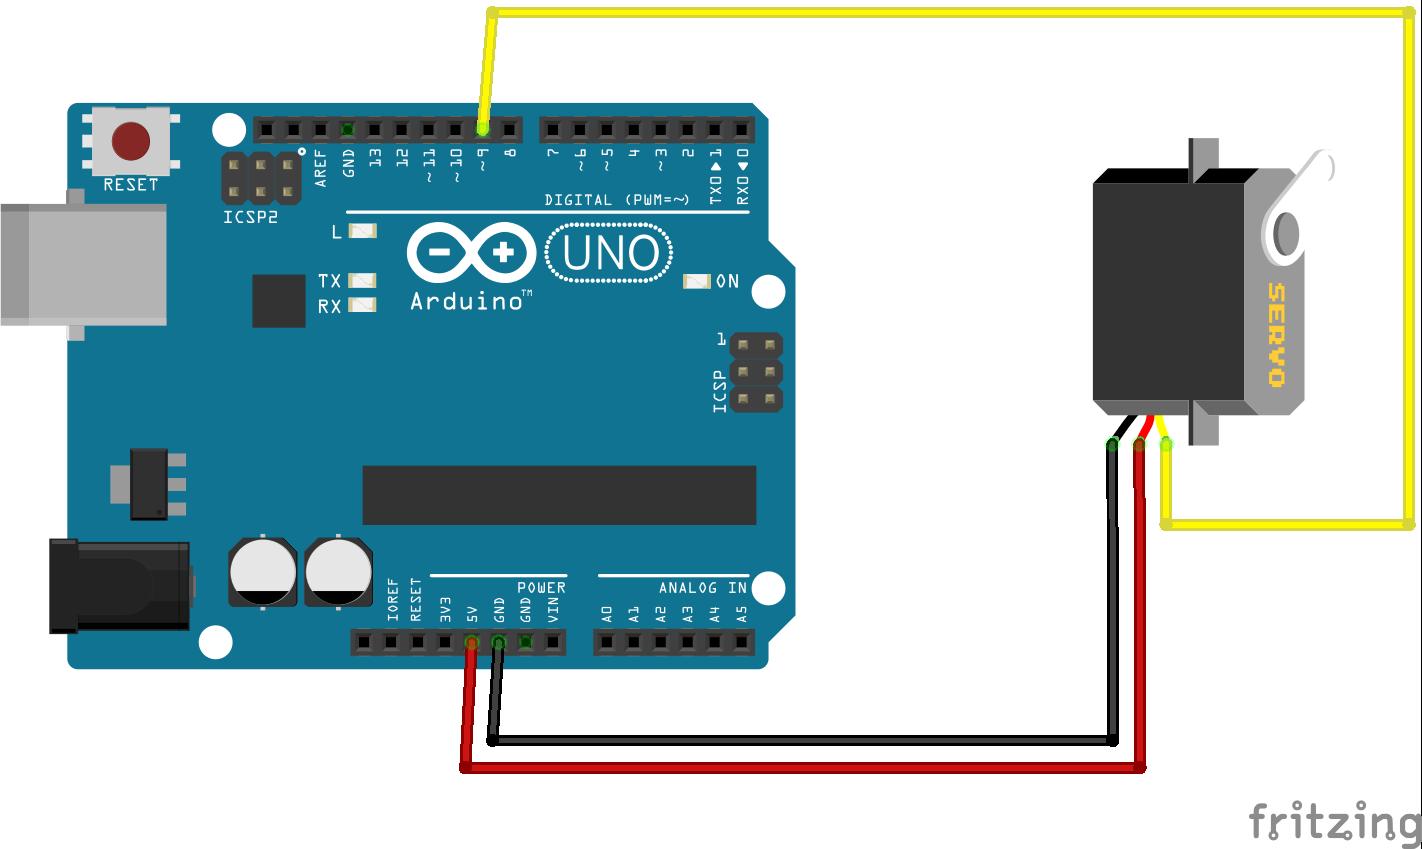 Servo tester using Arduino UNO, Visual Studio and C#